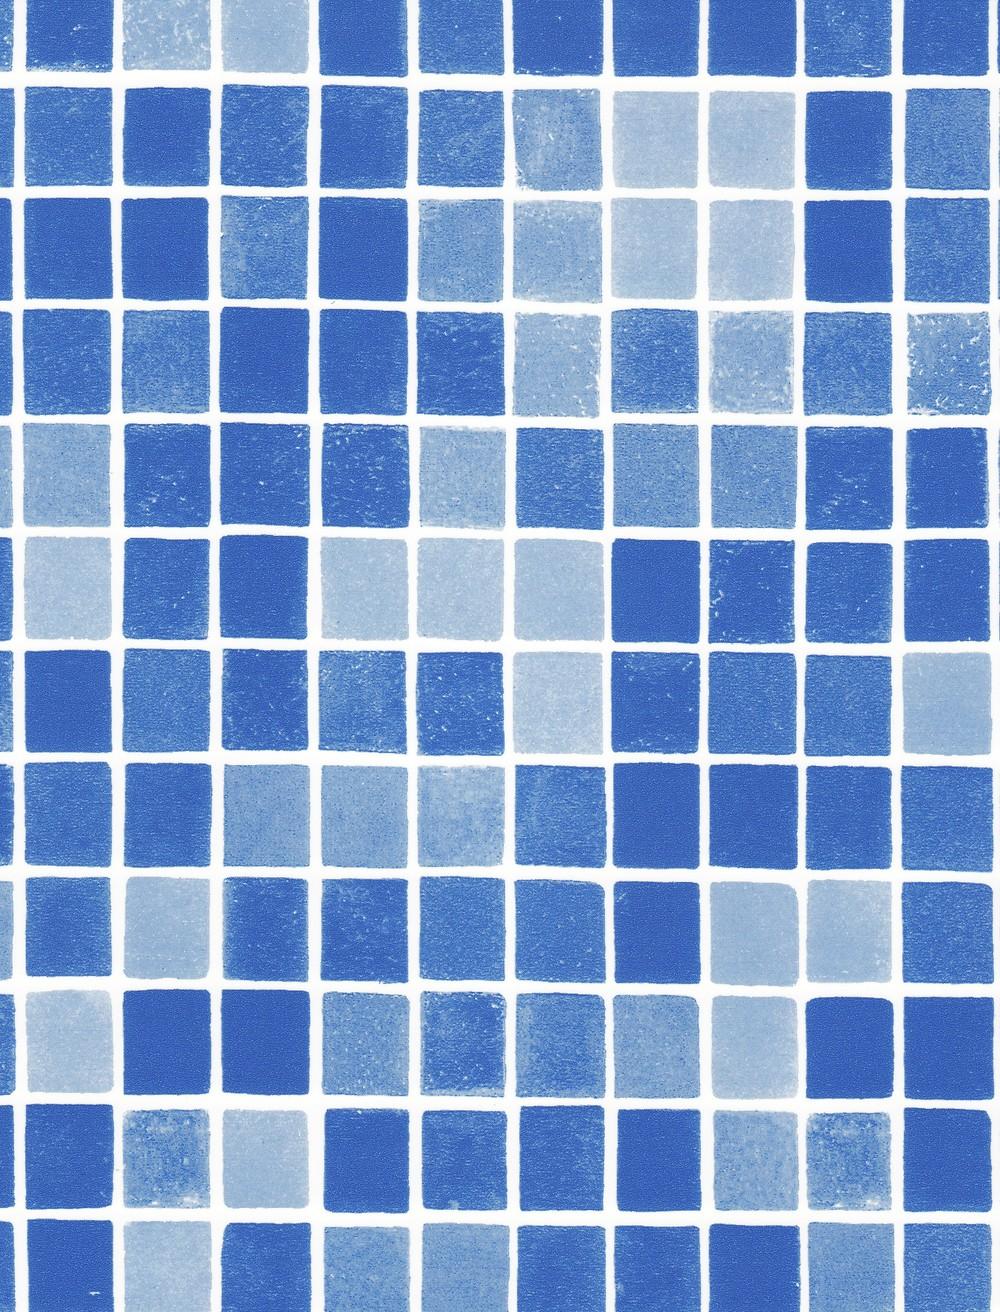 Crystal Mosaic.jpg